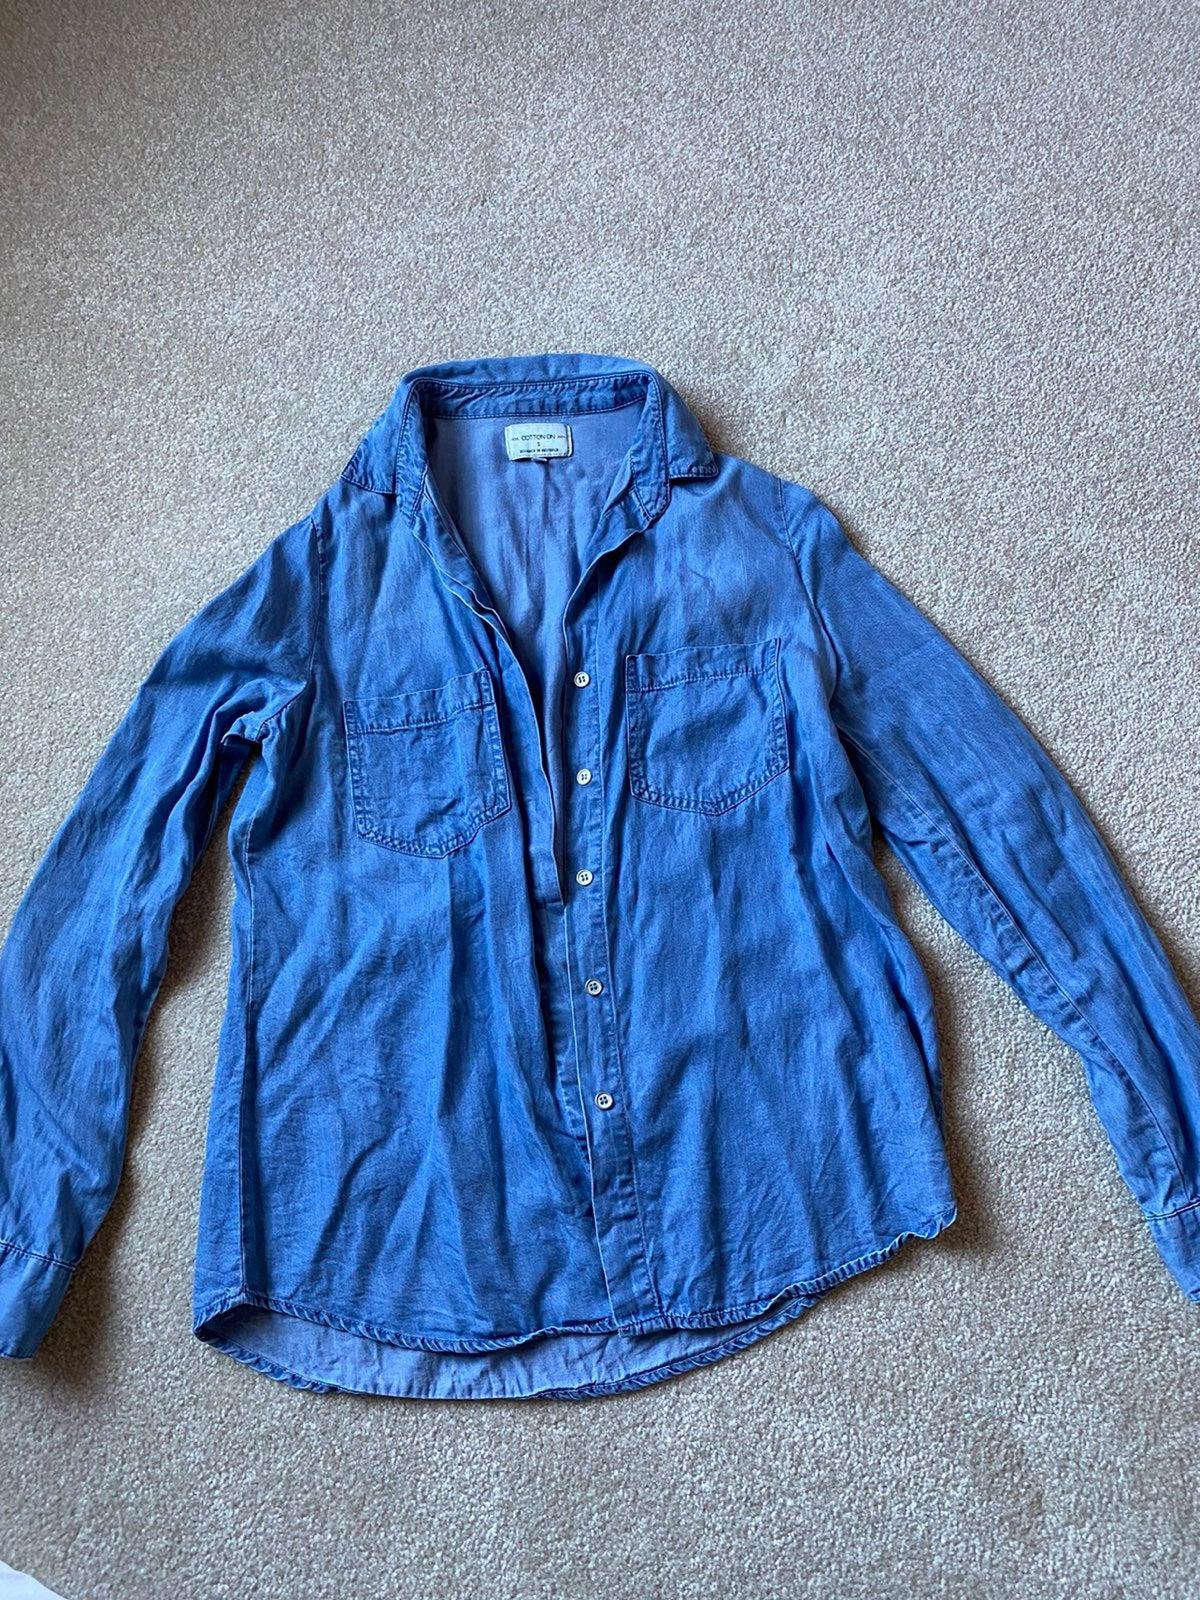 Cotton On Jean Shirt